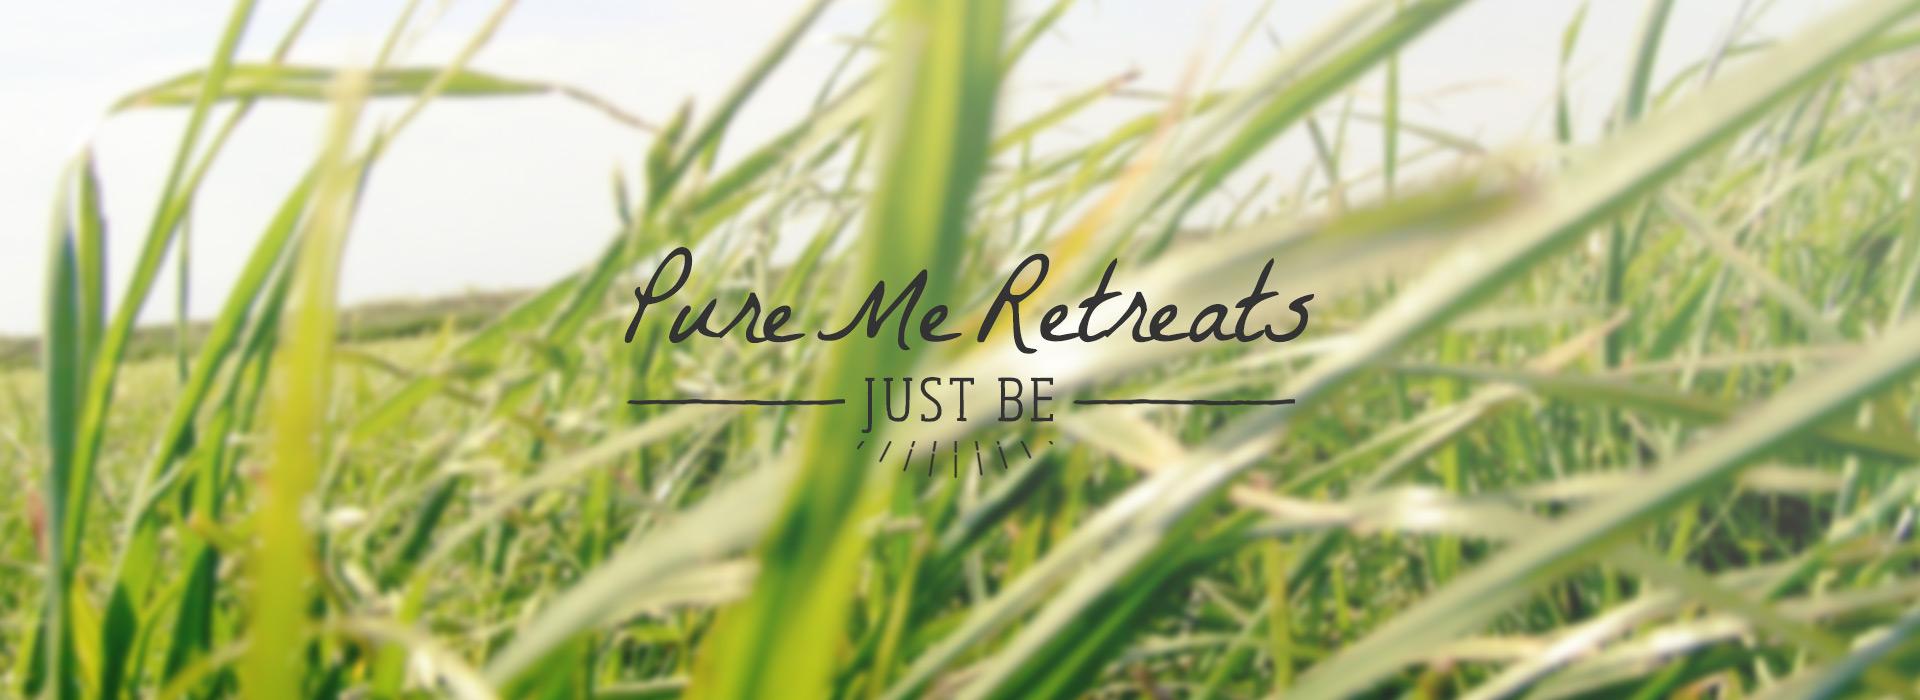 Pure-Me-Retreats-slider3